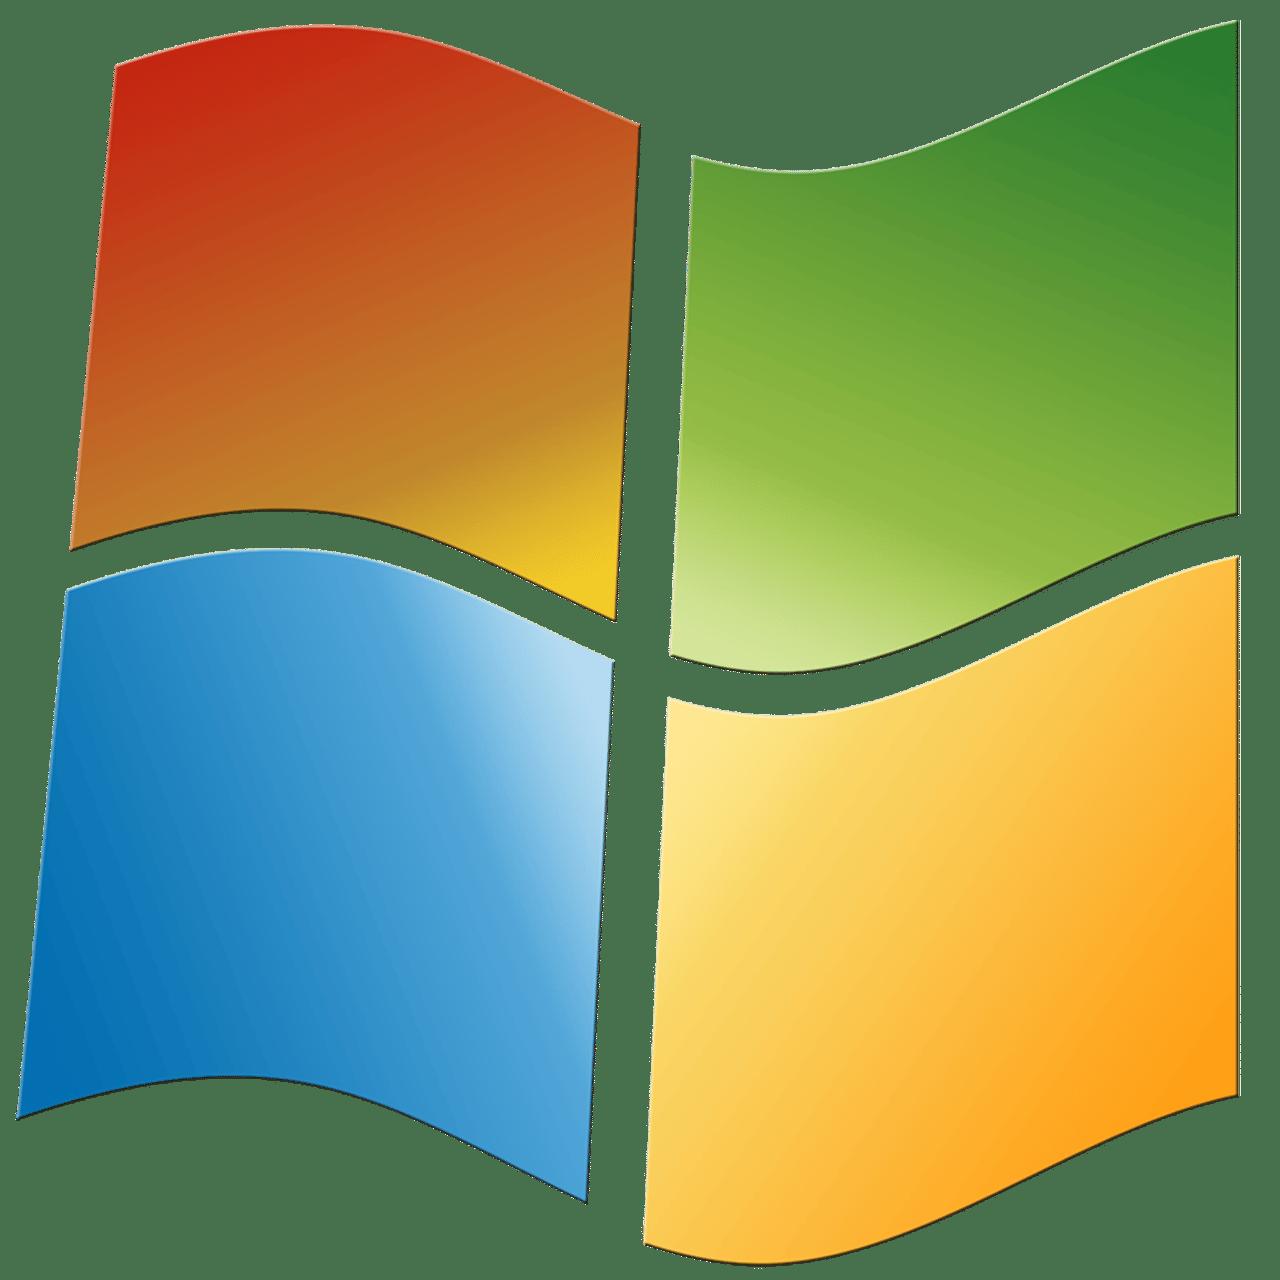 La licence de Windows 7 sera bientôt obsolète